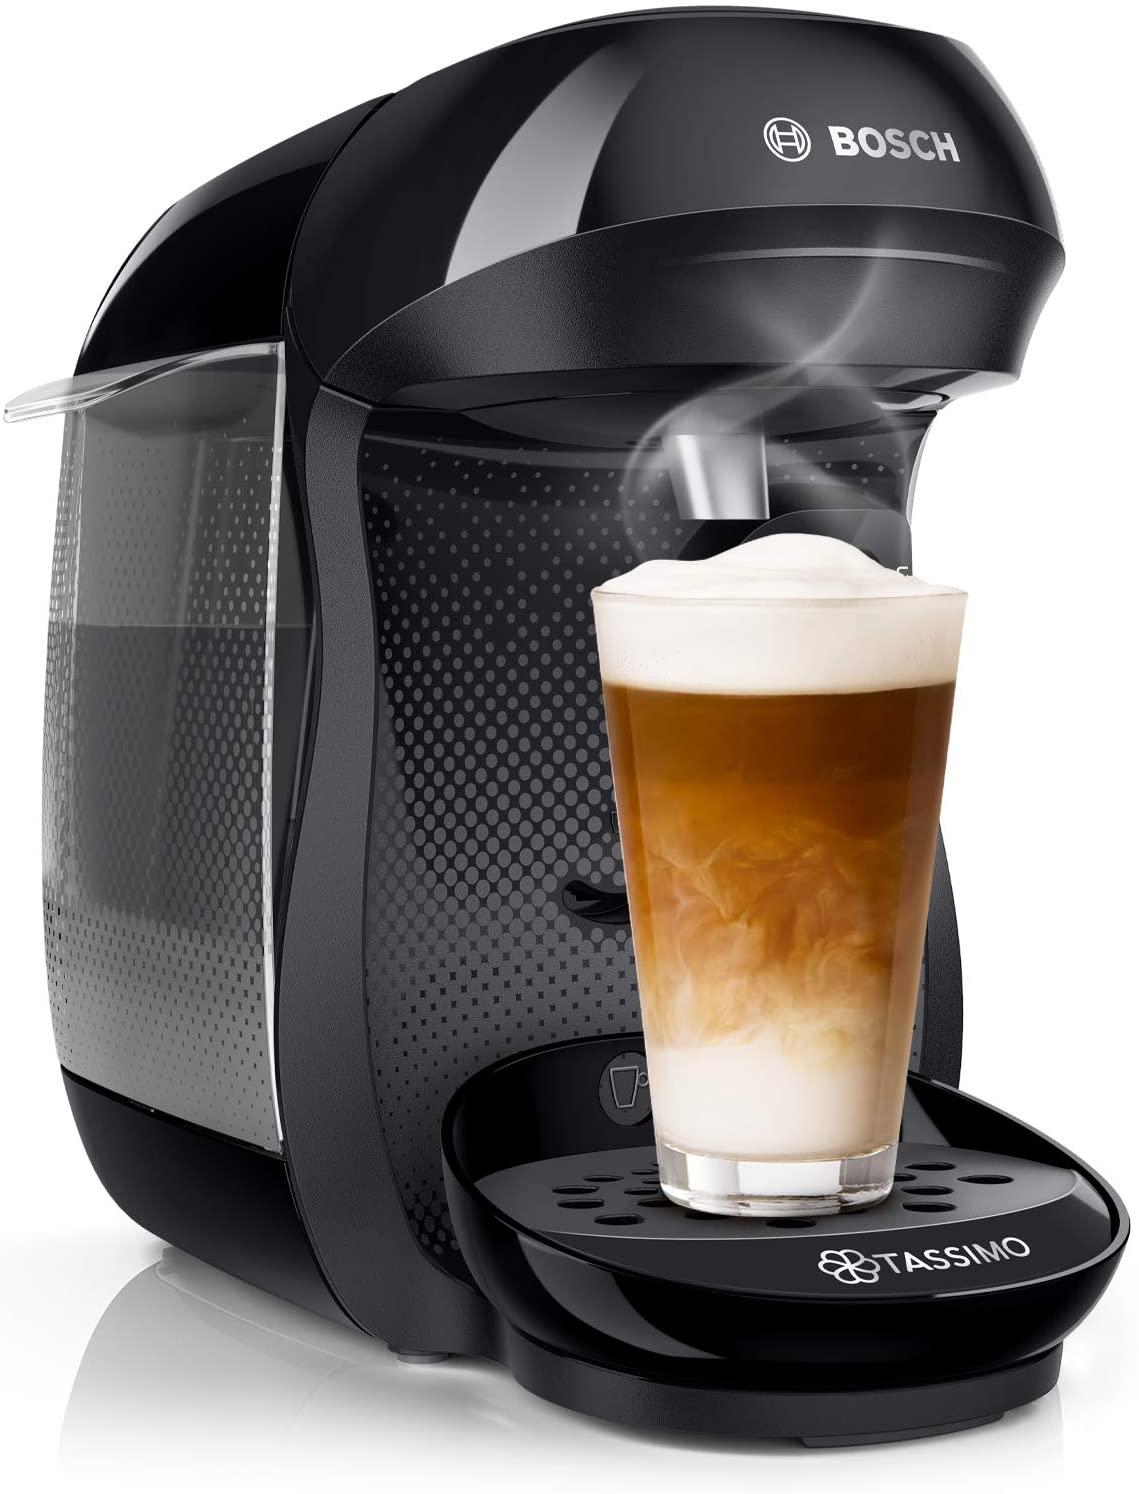 Bosch TAS1406 Tassimo Vivy2 Capsule Coffee Machine black/charcoal - Used Acceptable £22.56 (UK Mainland) @ Amazon Warehouse Germany